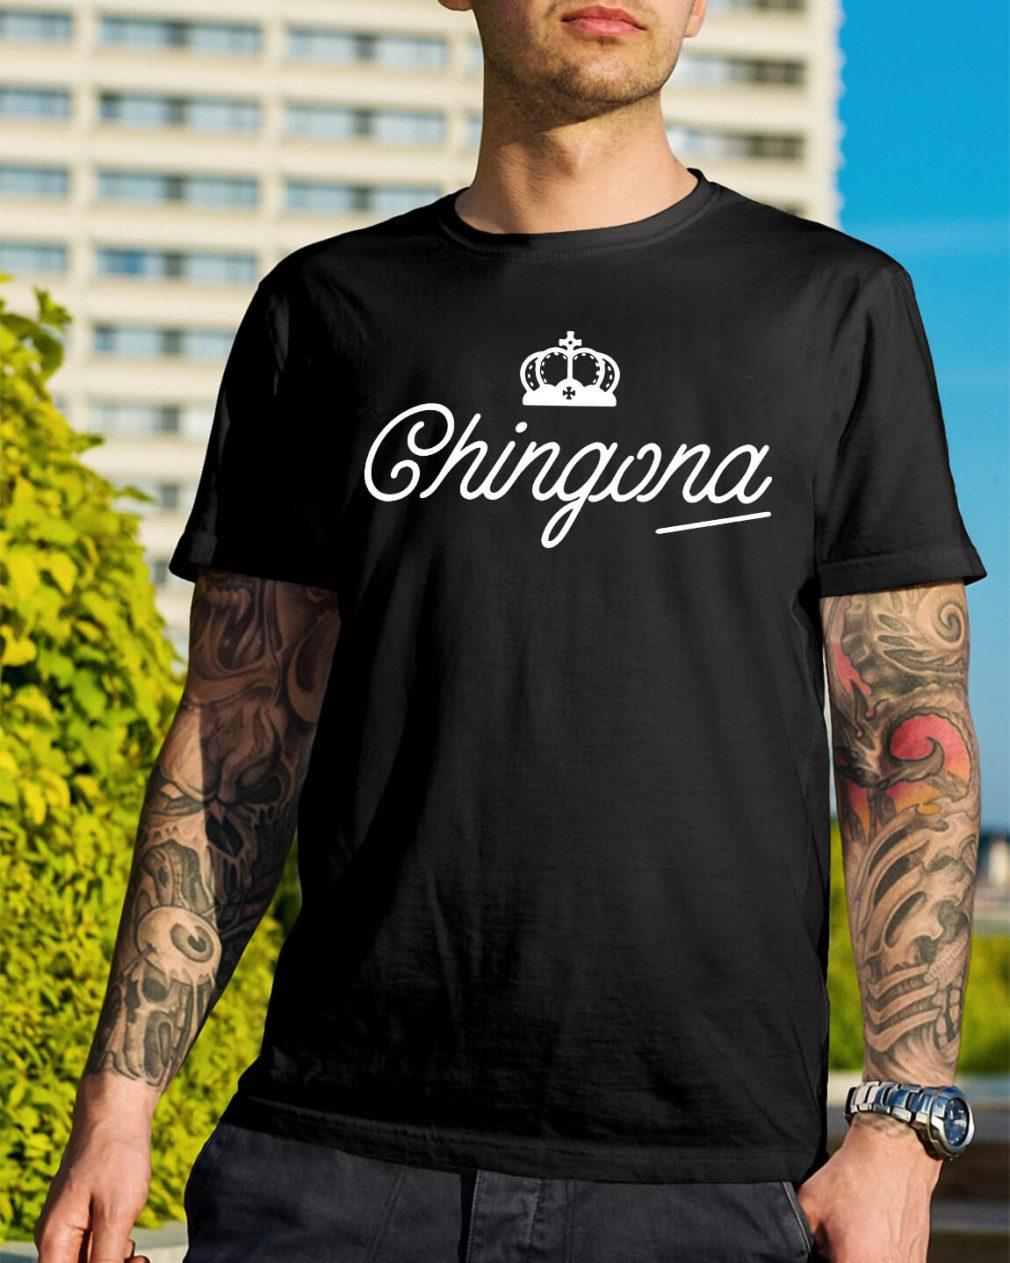 Official Chingona shirt